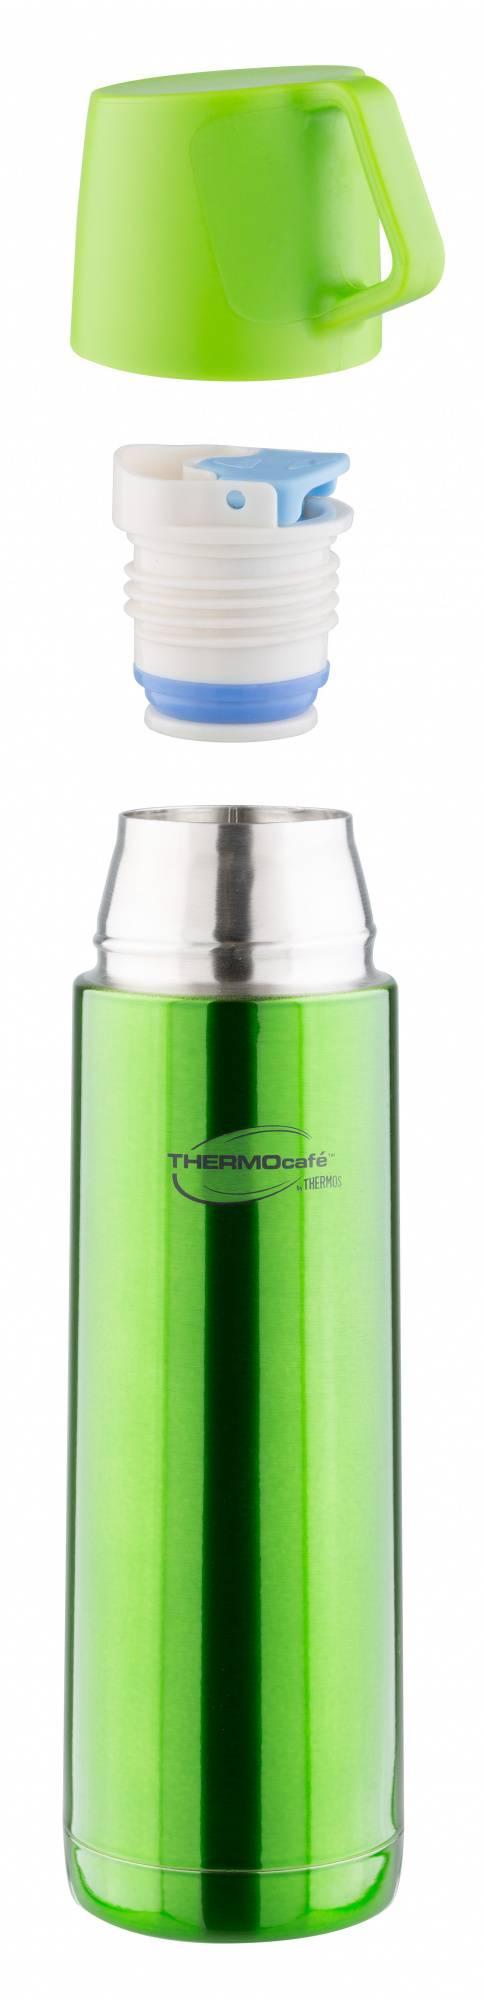 Термос Thermos THERMOcafe JF-500 салатовый - фото 2